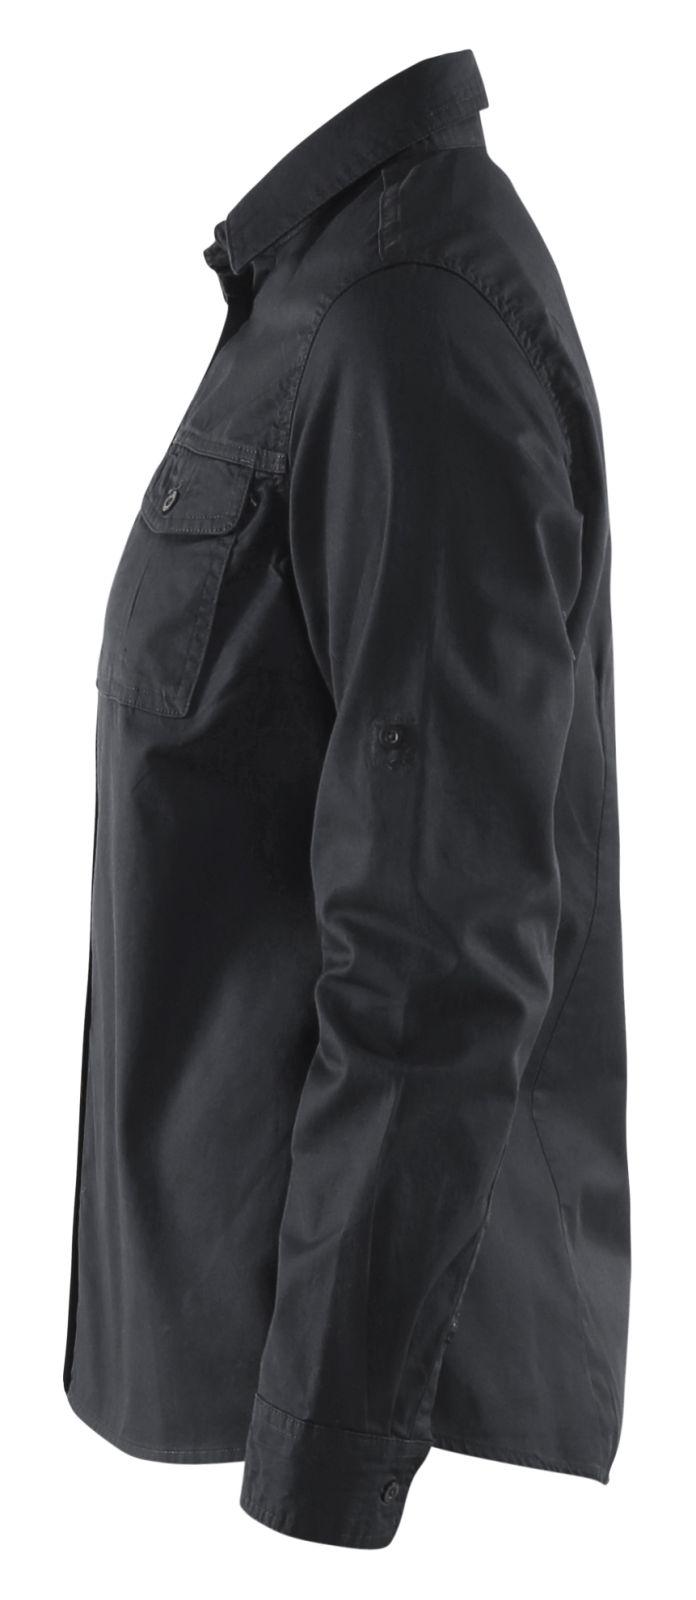 Blaklader Dames overhemden 32081135 zwart(9900)